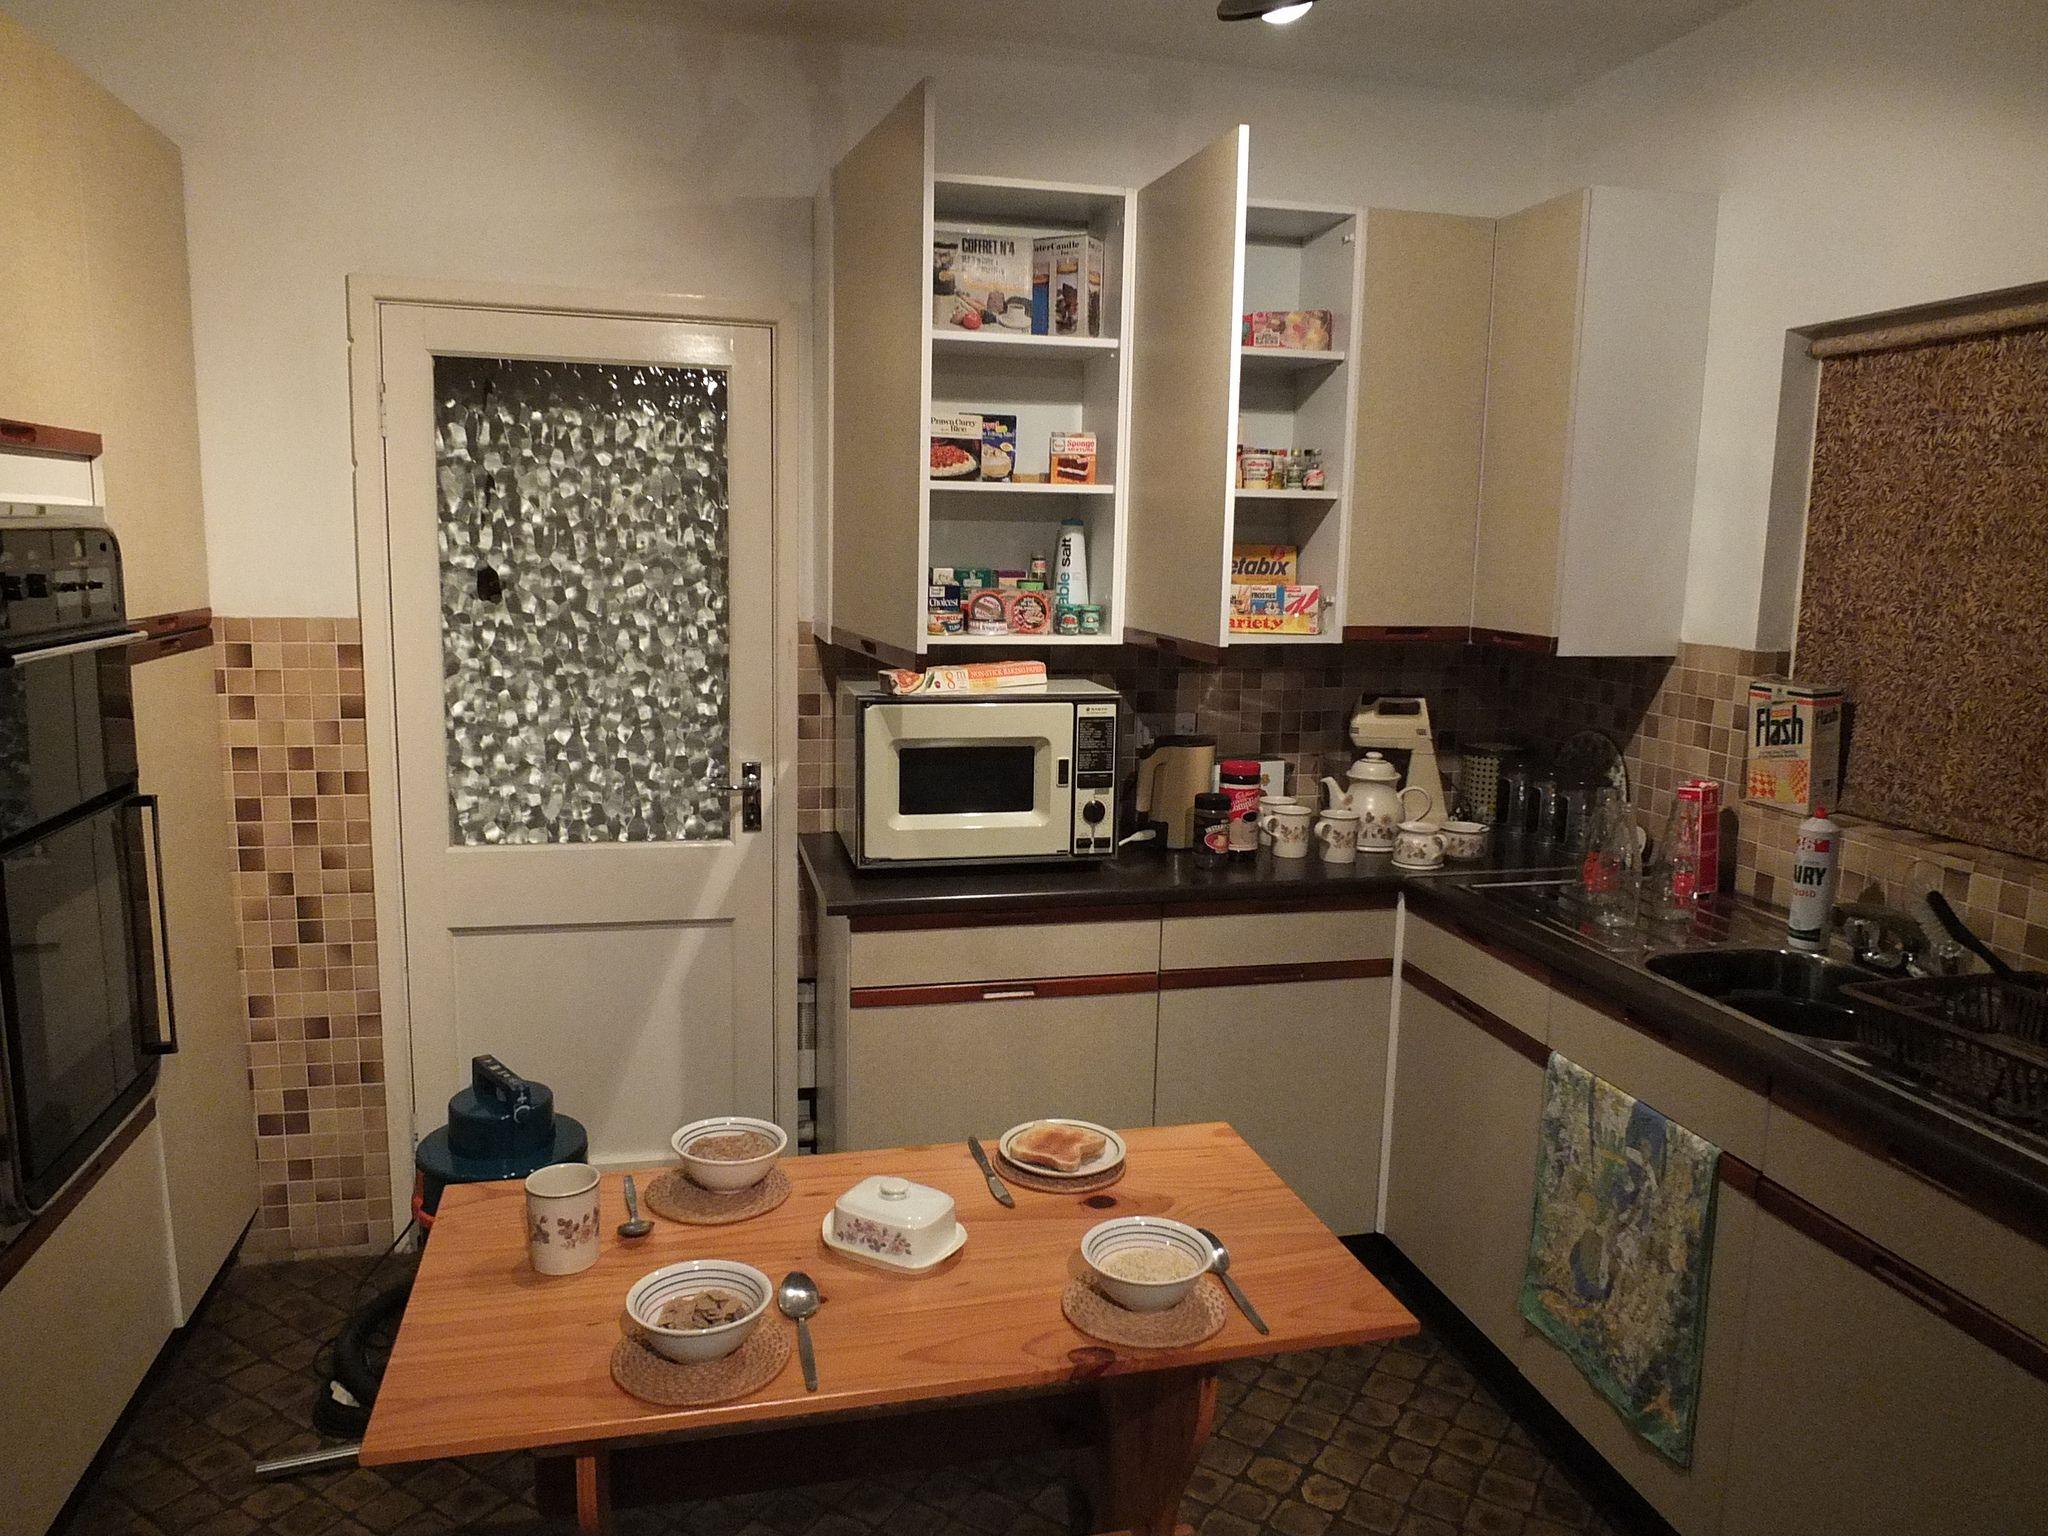 the 1980s kitchen kitchen wall units kitchen design kitchen on kitchen remodel timeline id=59103